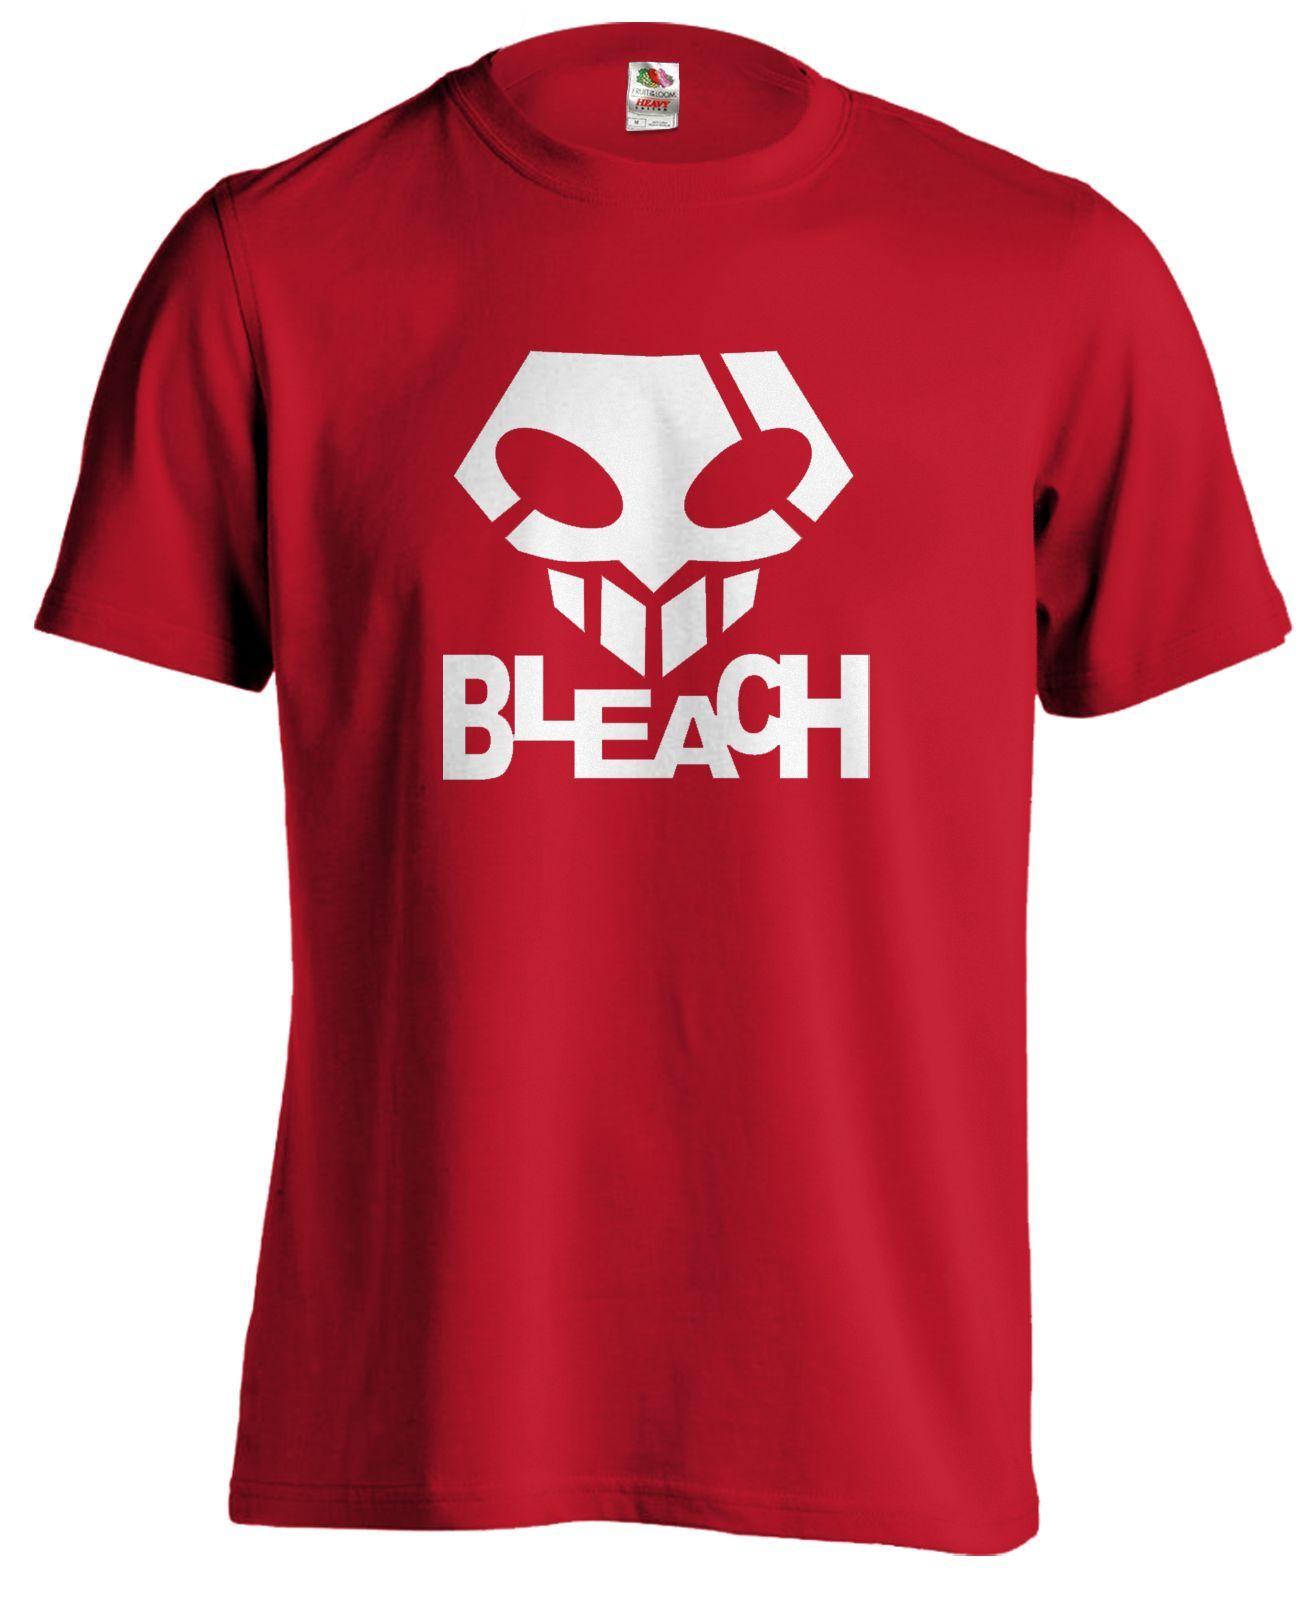 Bleach Skull Logo Anime Manga T Shirt Tee Cartoon